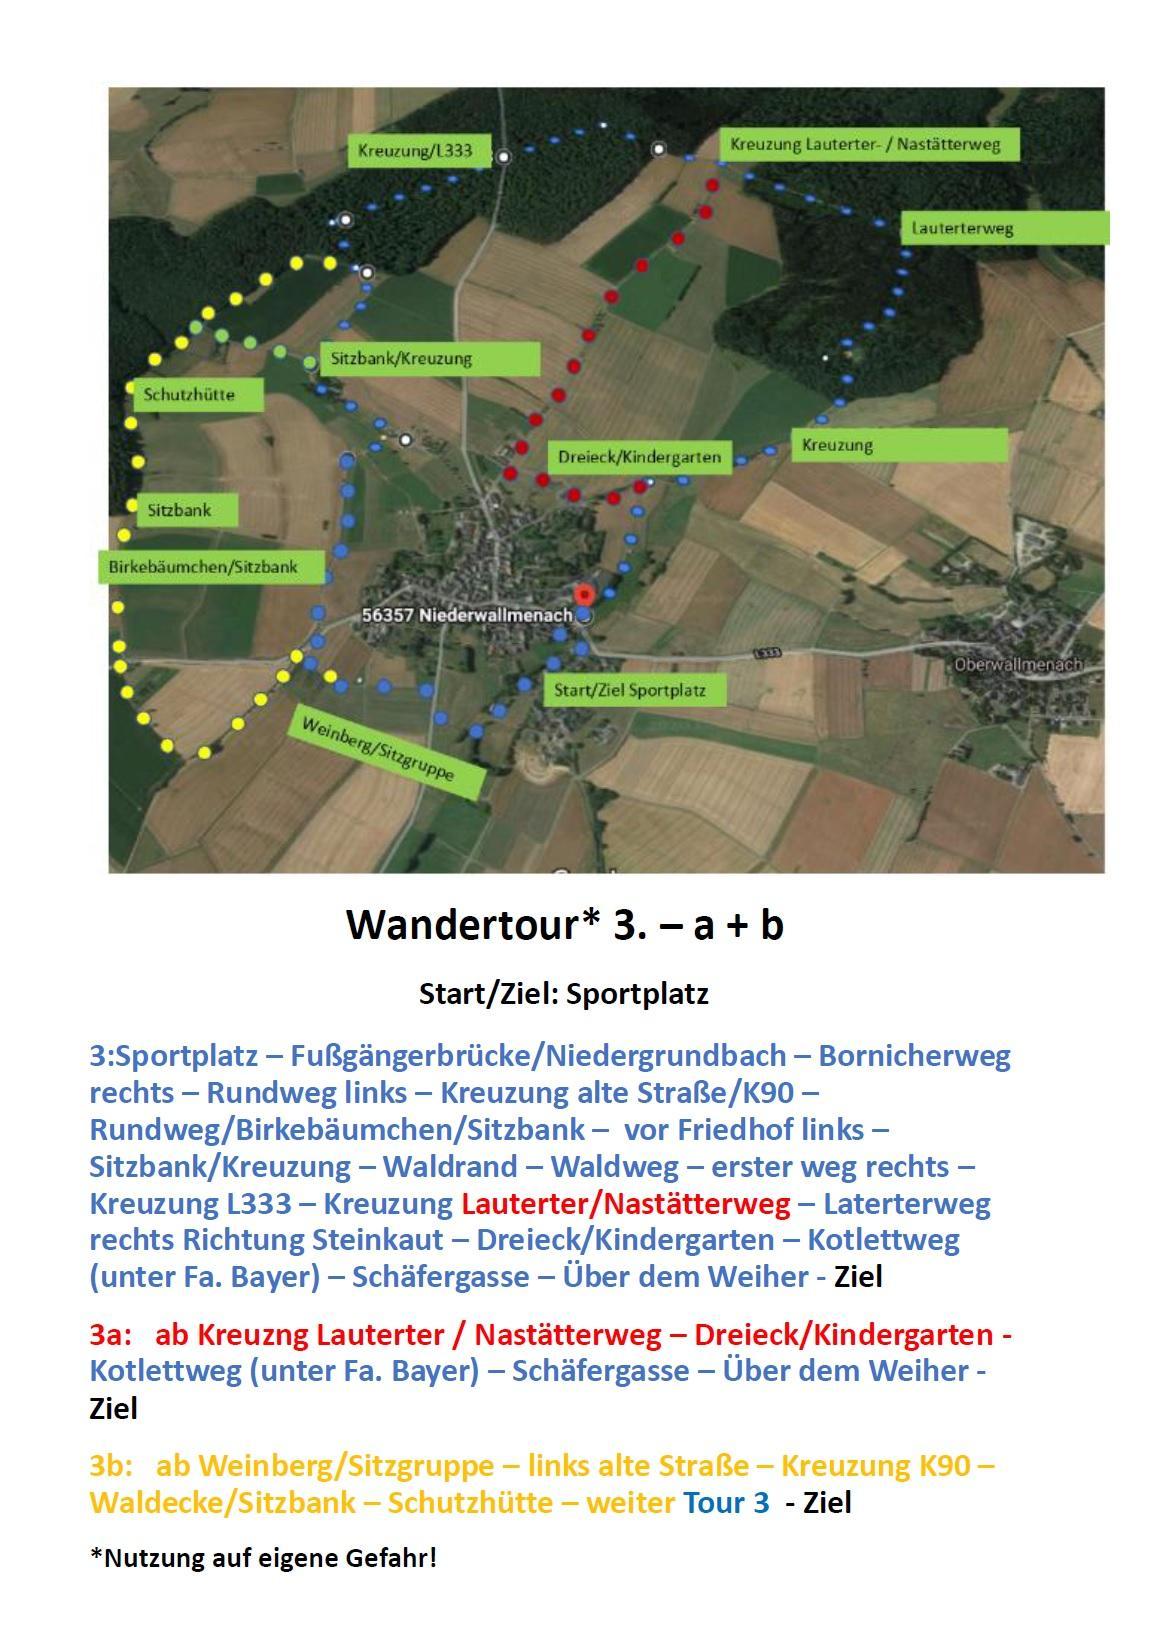 Wandertour 3